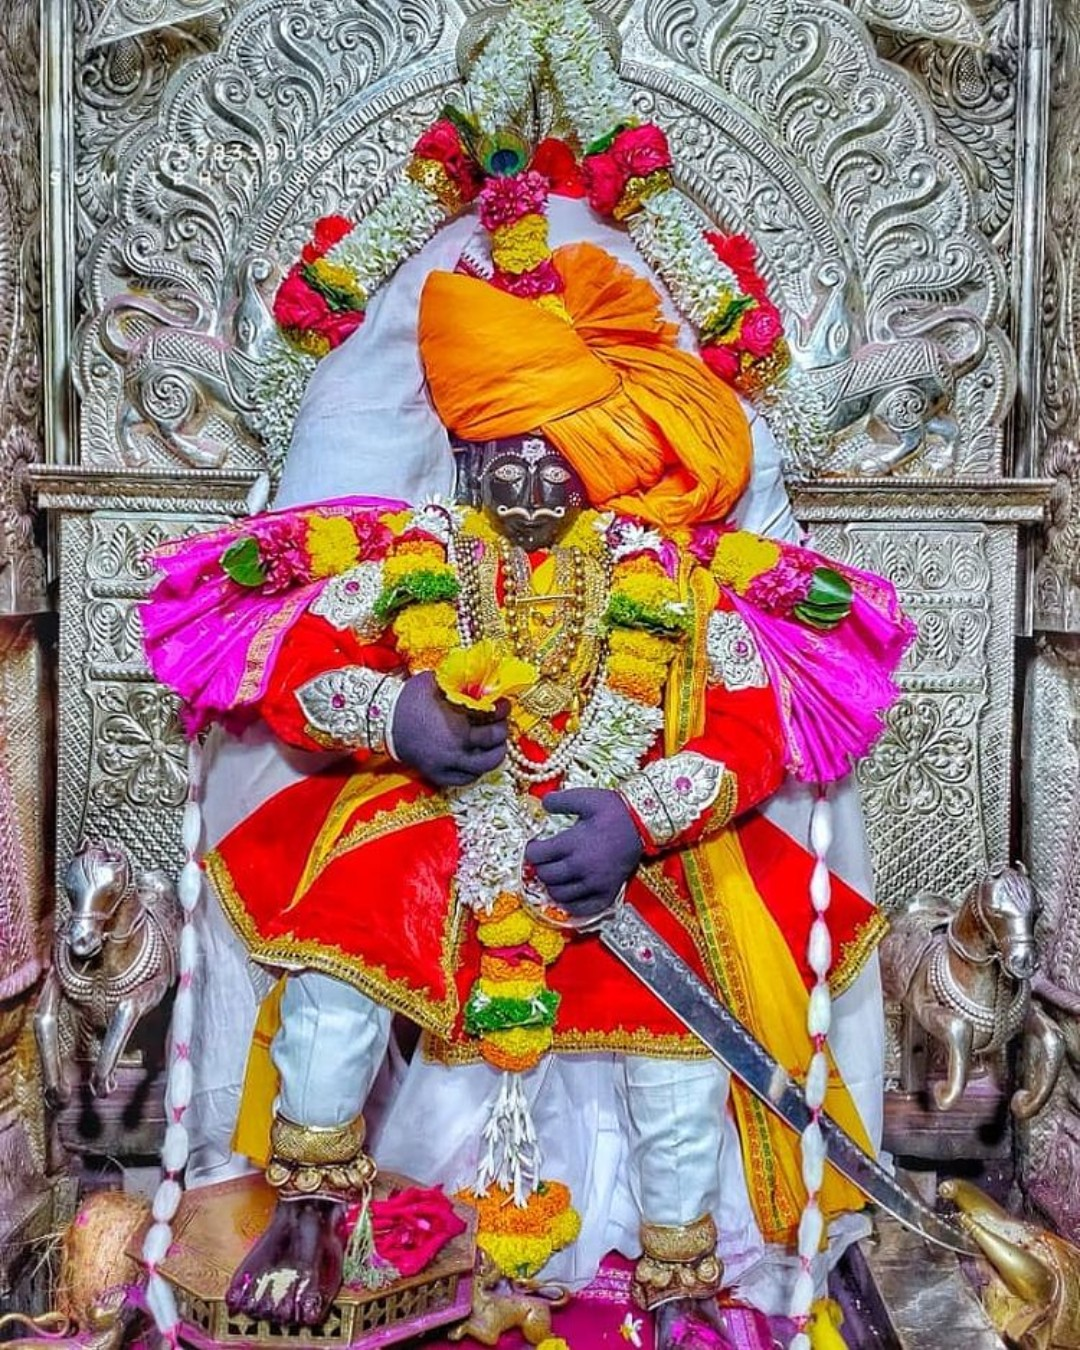 DakhkhanchaRajaJyotiba #marathistars ...